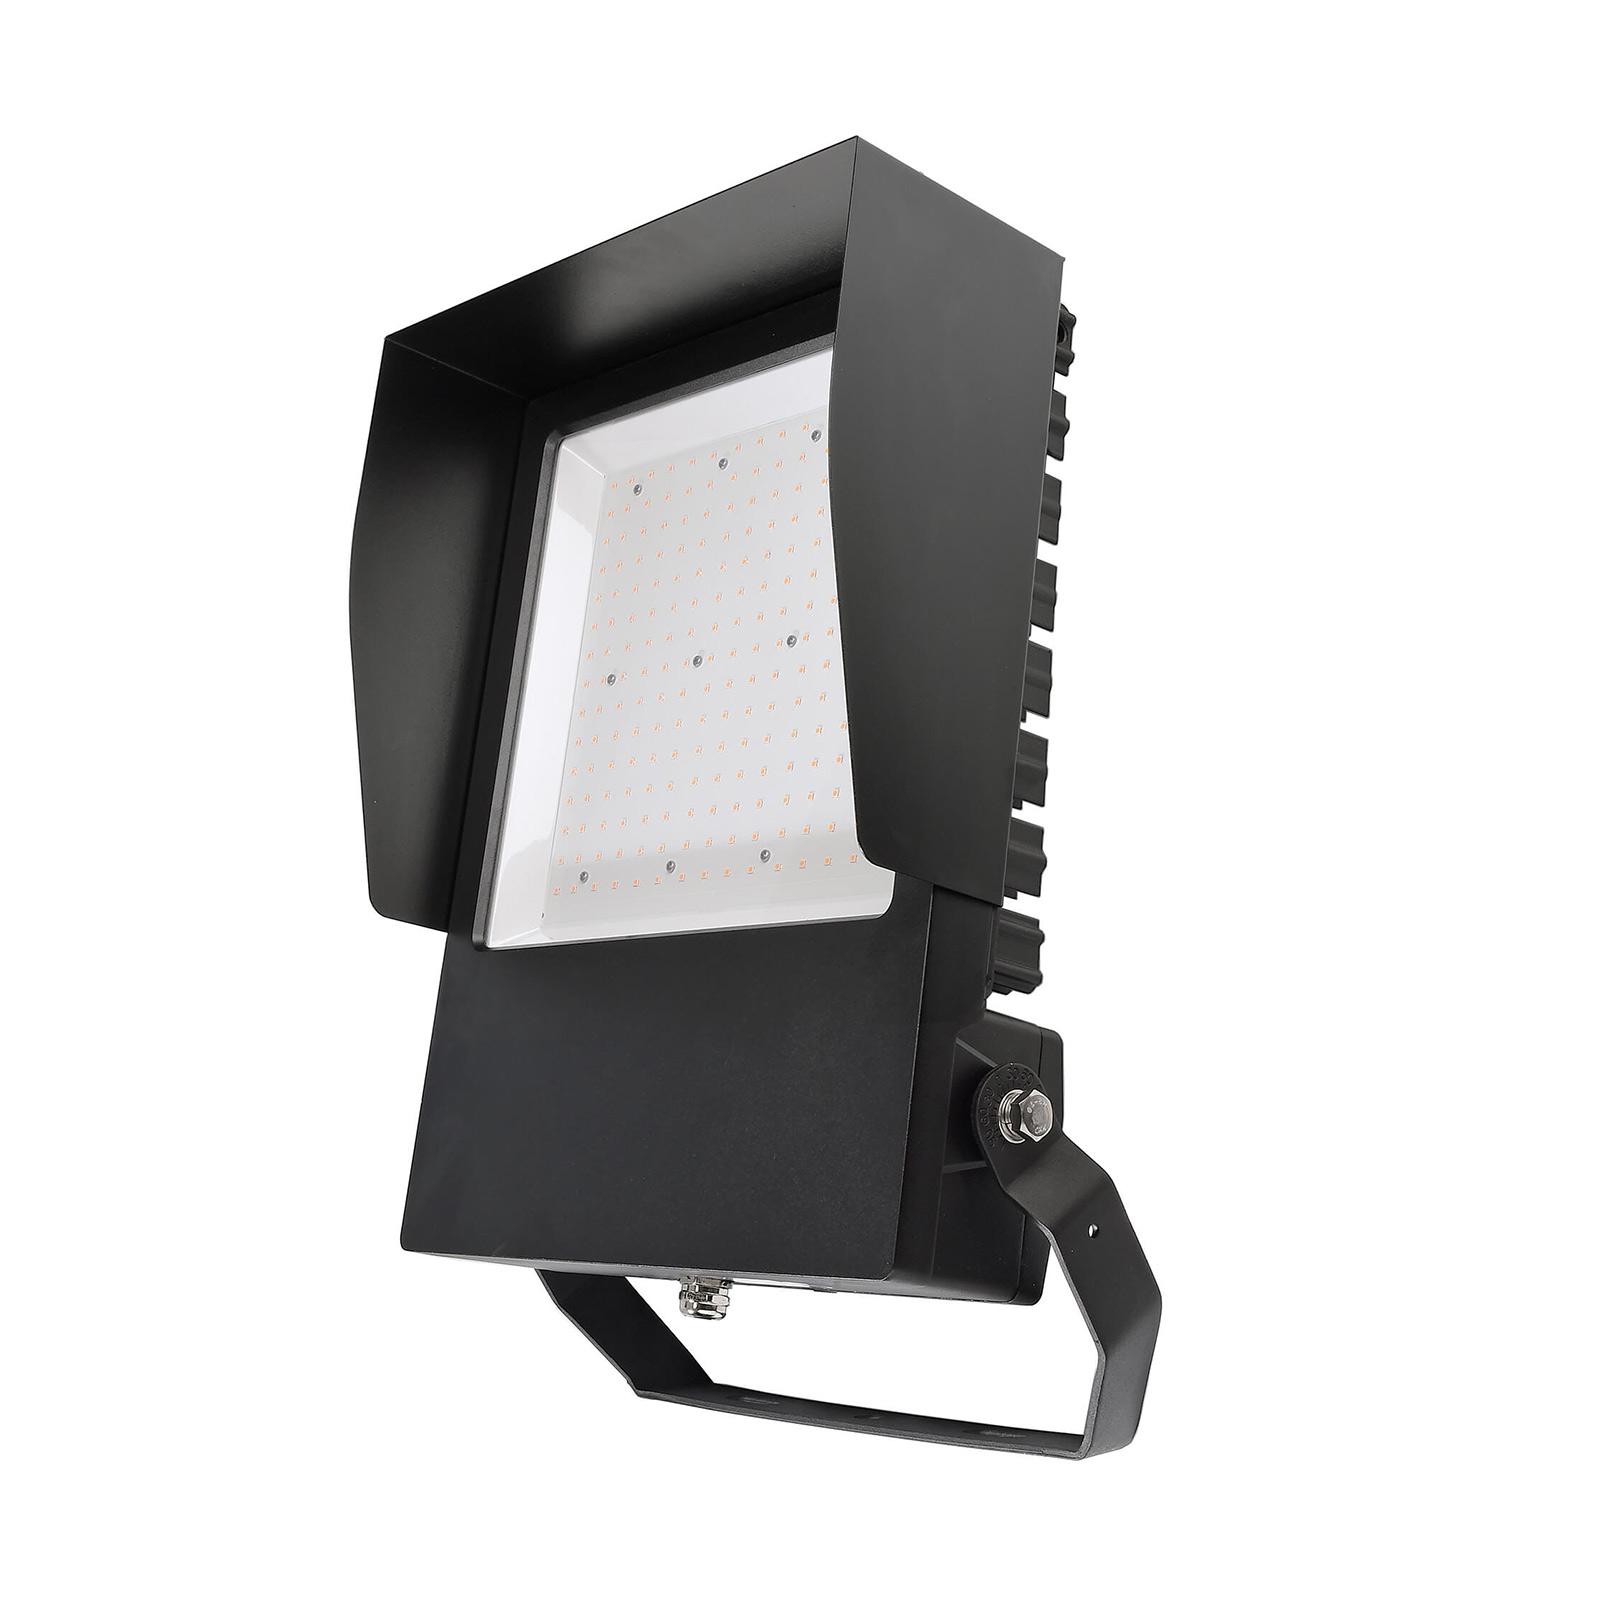 Blendschutz für LED-Strahler Atik